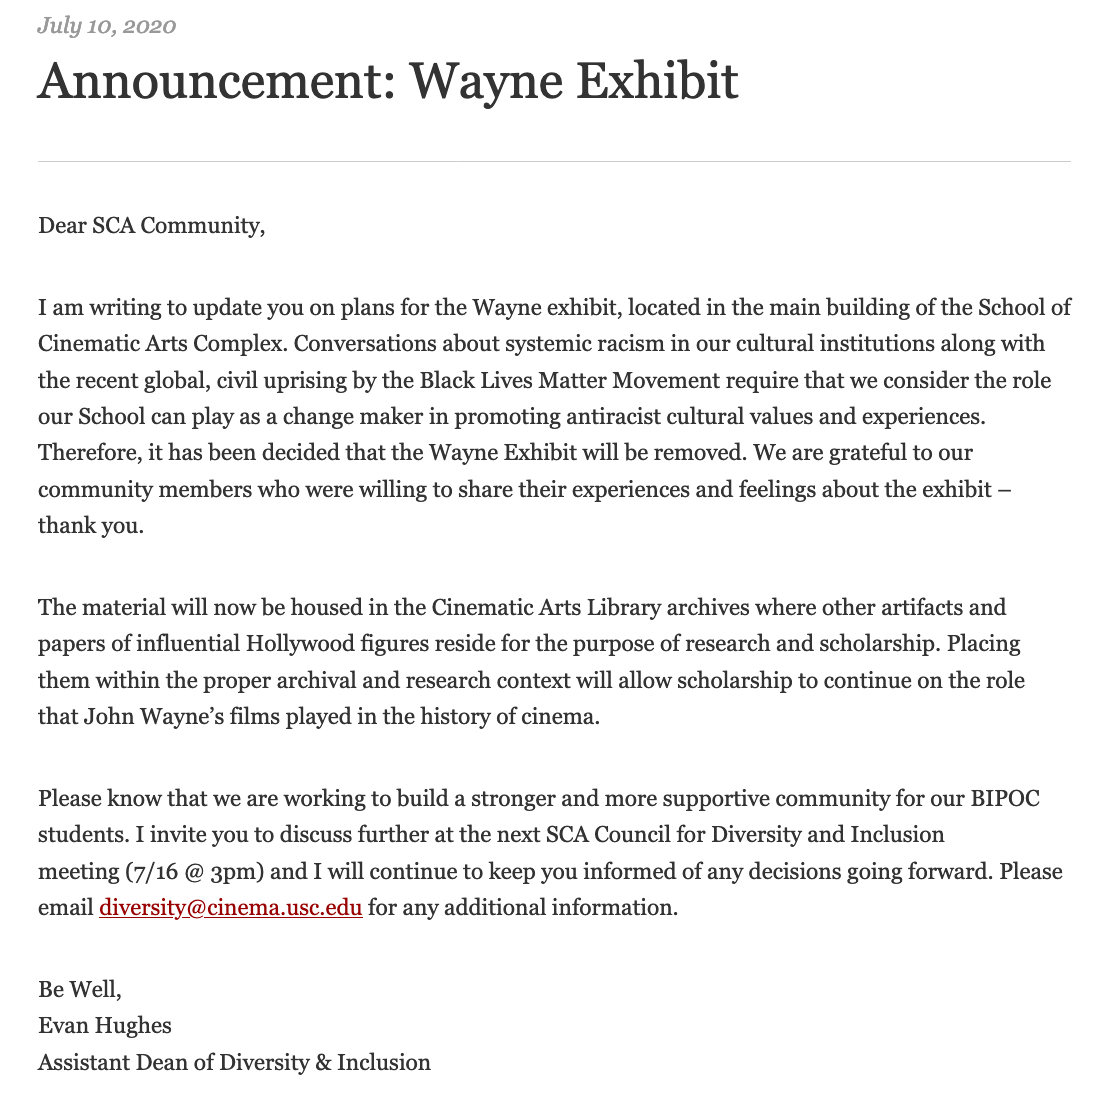 Announcement concerning the John Wayne exhibit: